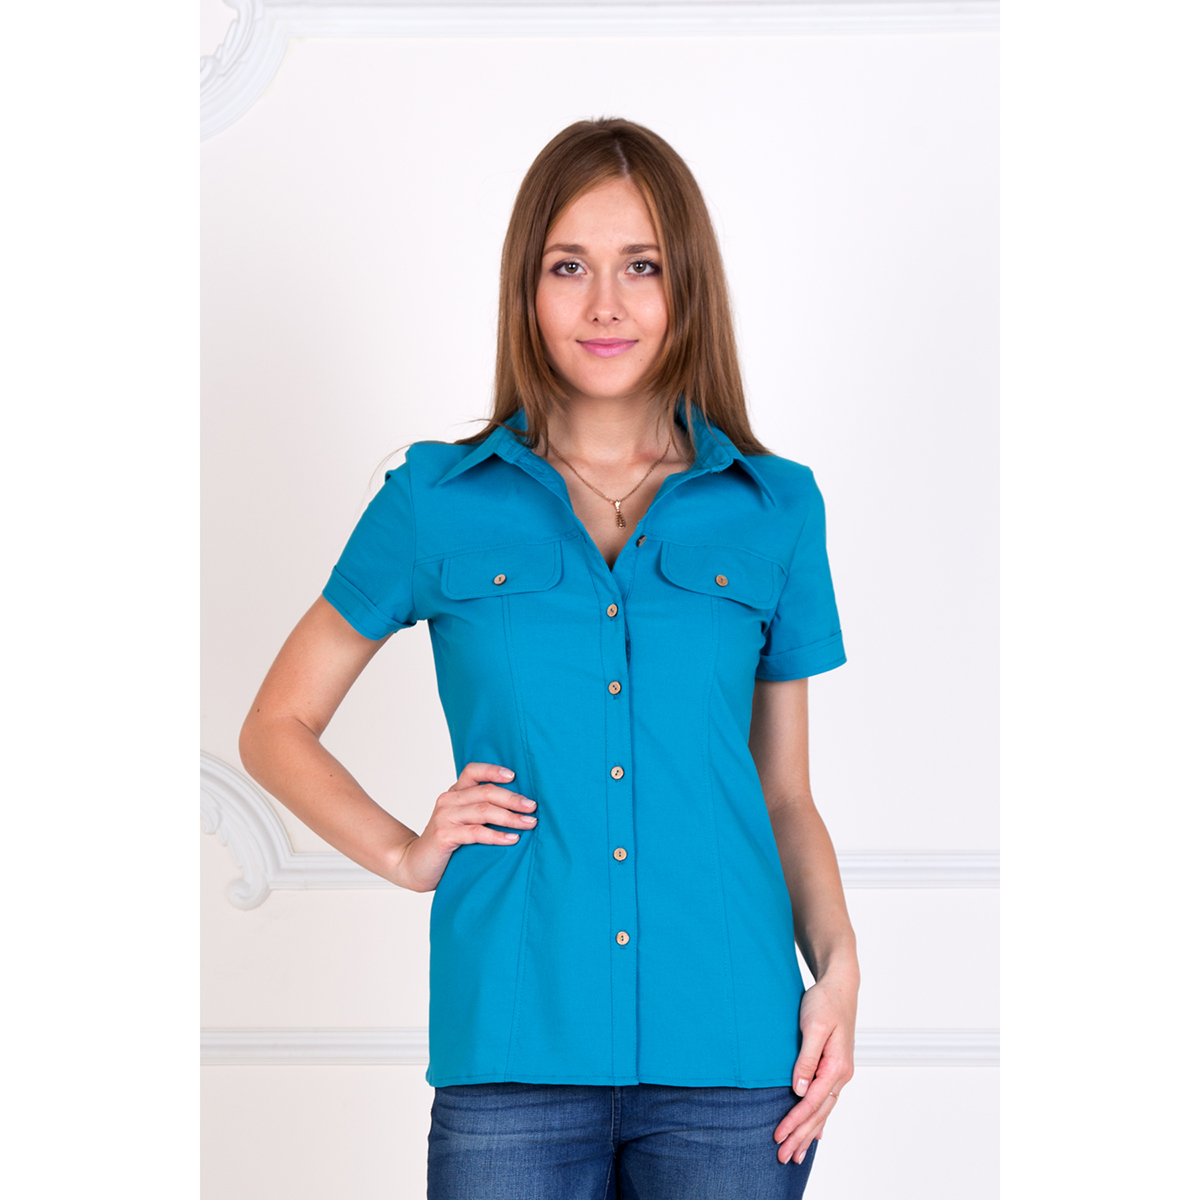 Женская рубашка  Александра  Голубой, размер 42 - Женская одежда артикул: 14912